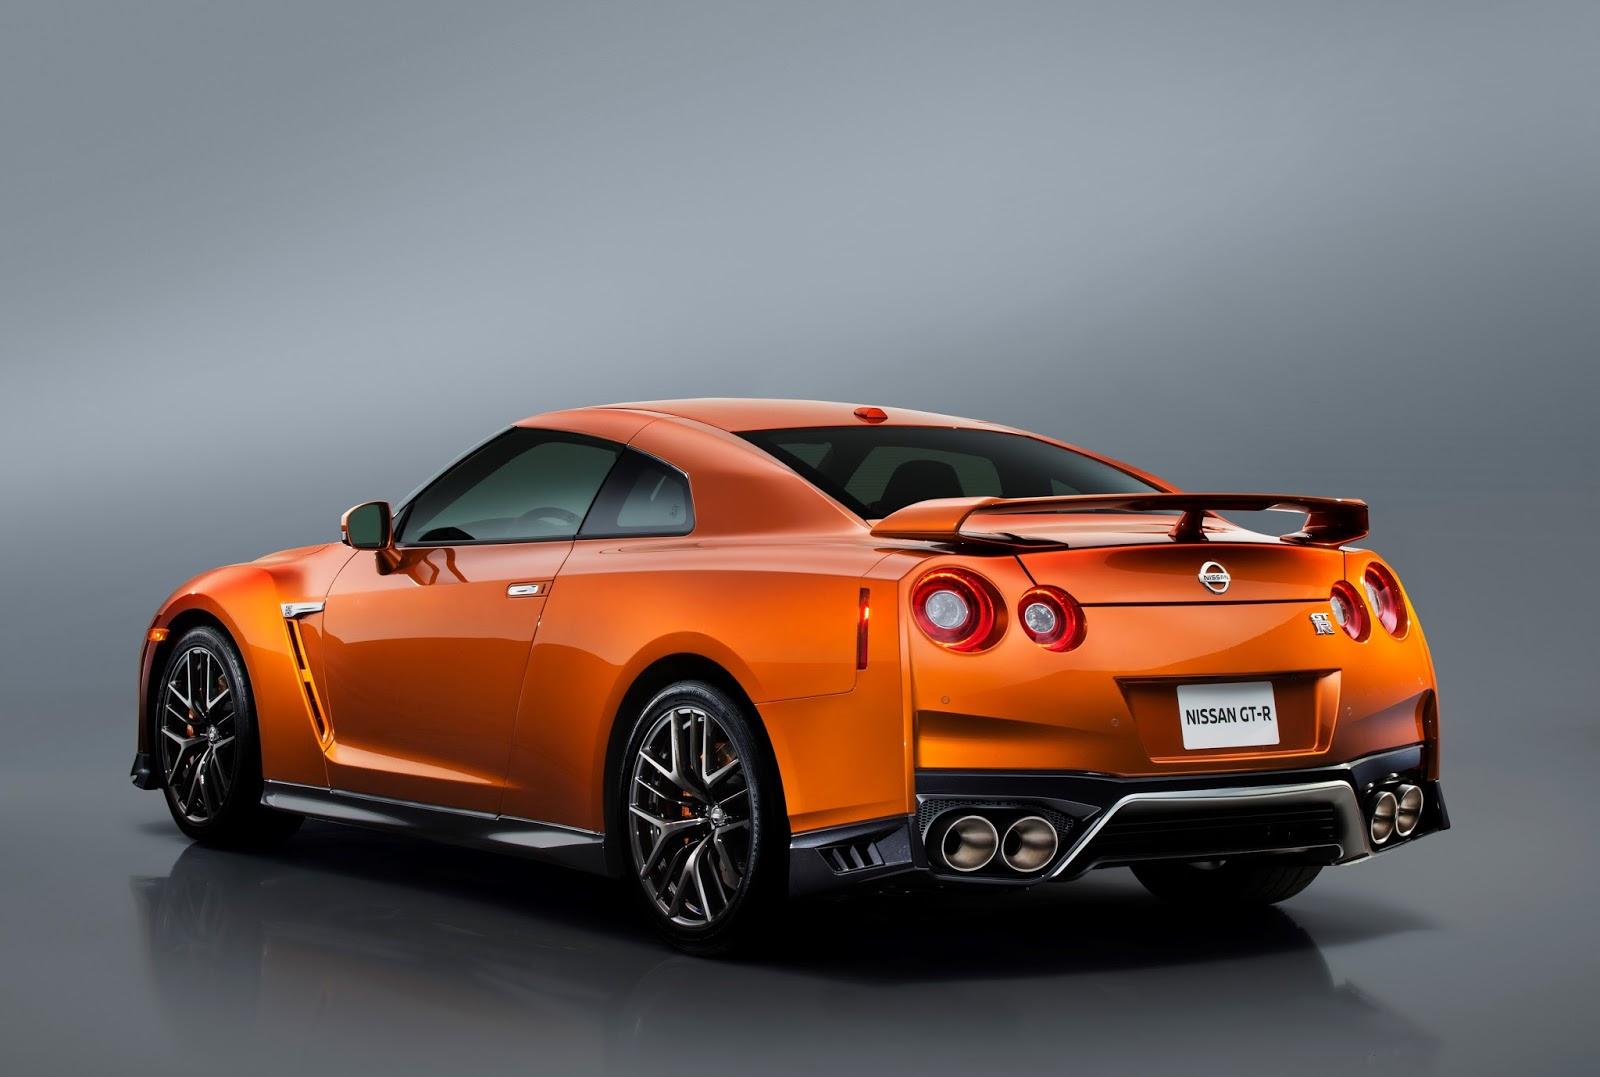 144066 1 5 Nissan GT-R: Ο Godzilla επέστρεψε! Godzilla, Nissan, Nissan GT-R, supercars, έκθεση Νέας Υόρκης